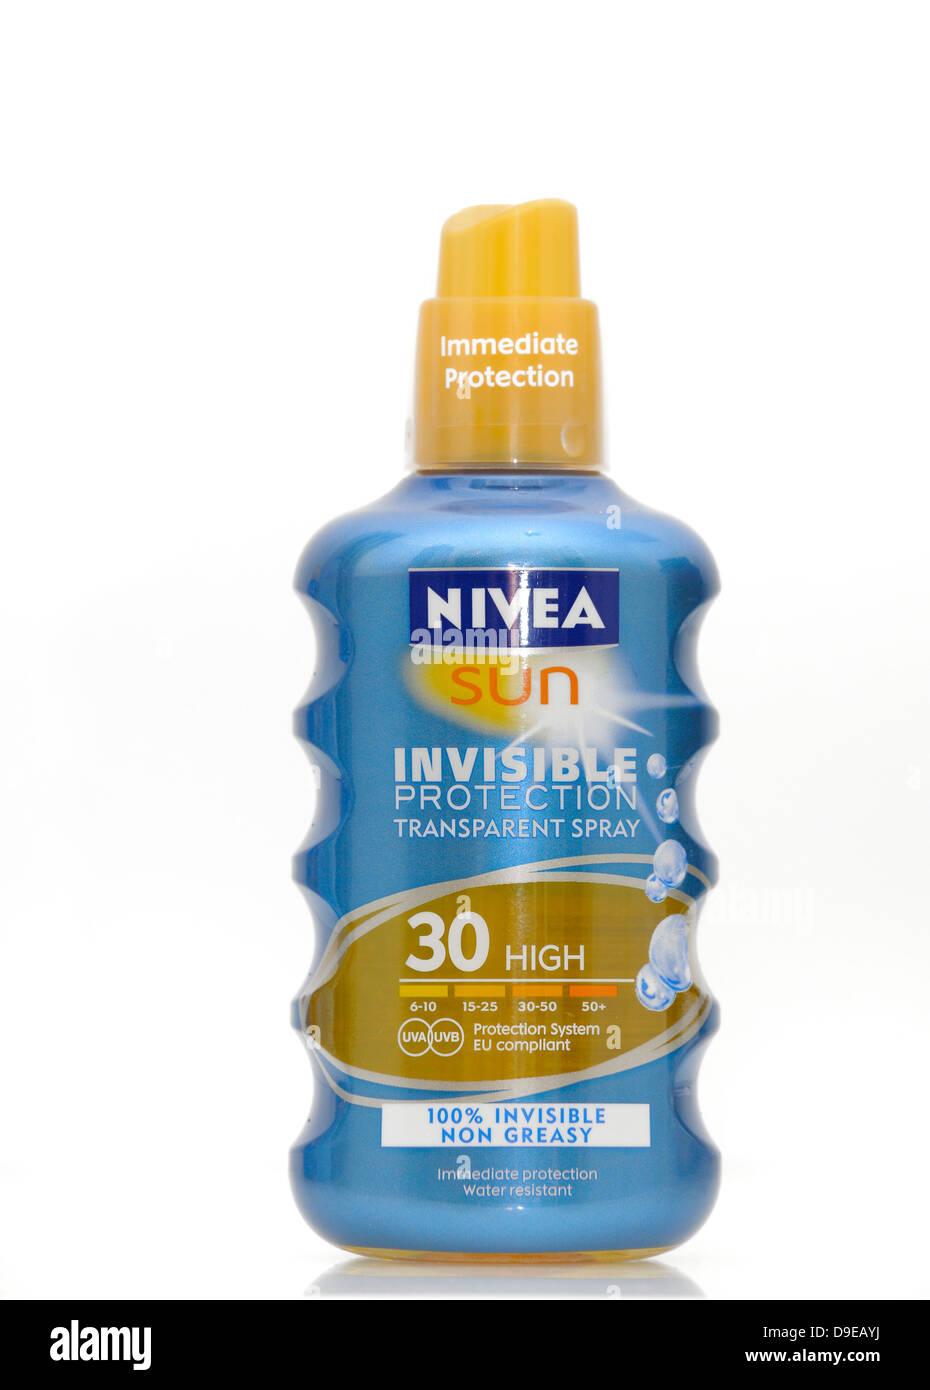 NIVEA sun invisible transparent spray protection oil factor 30 - Stock Image